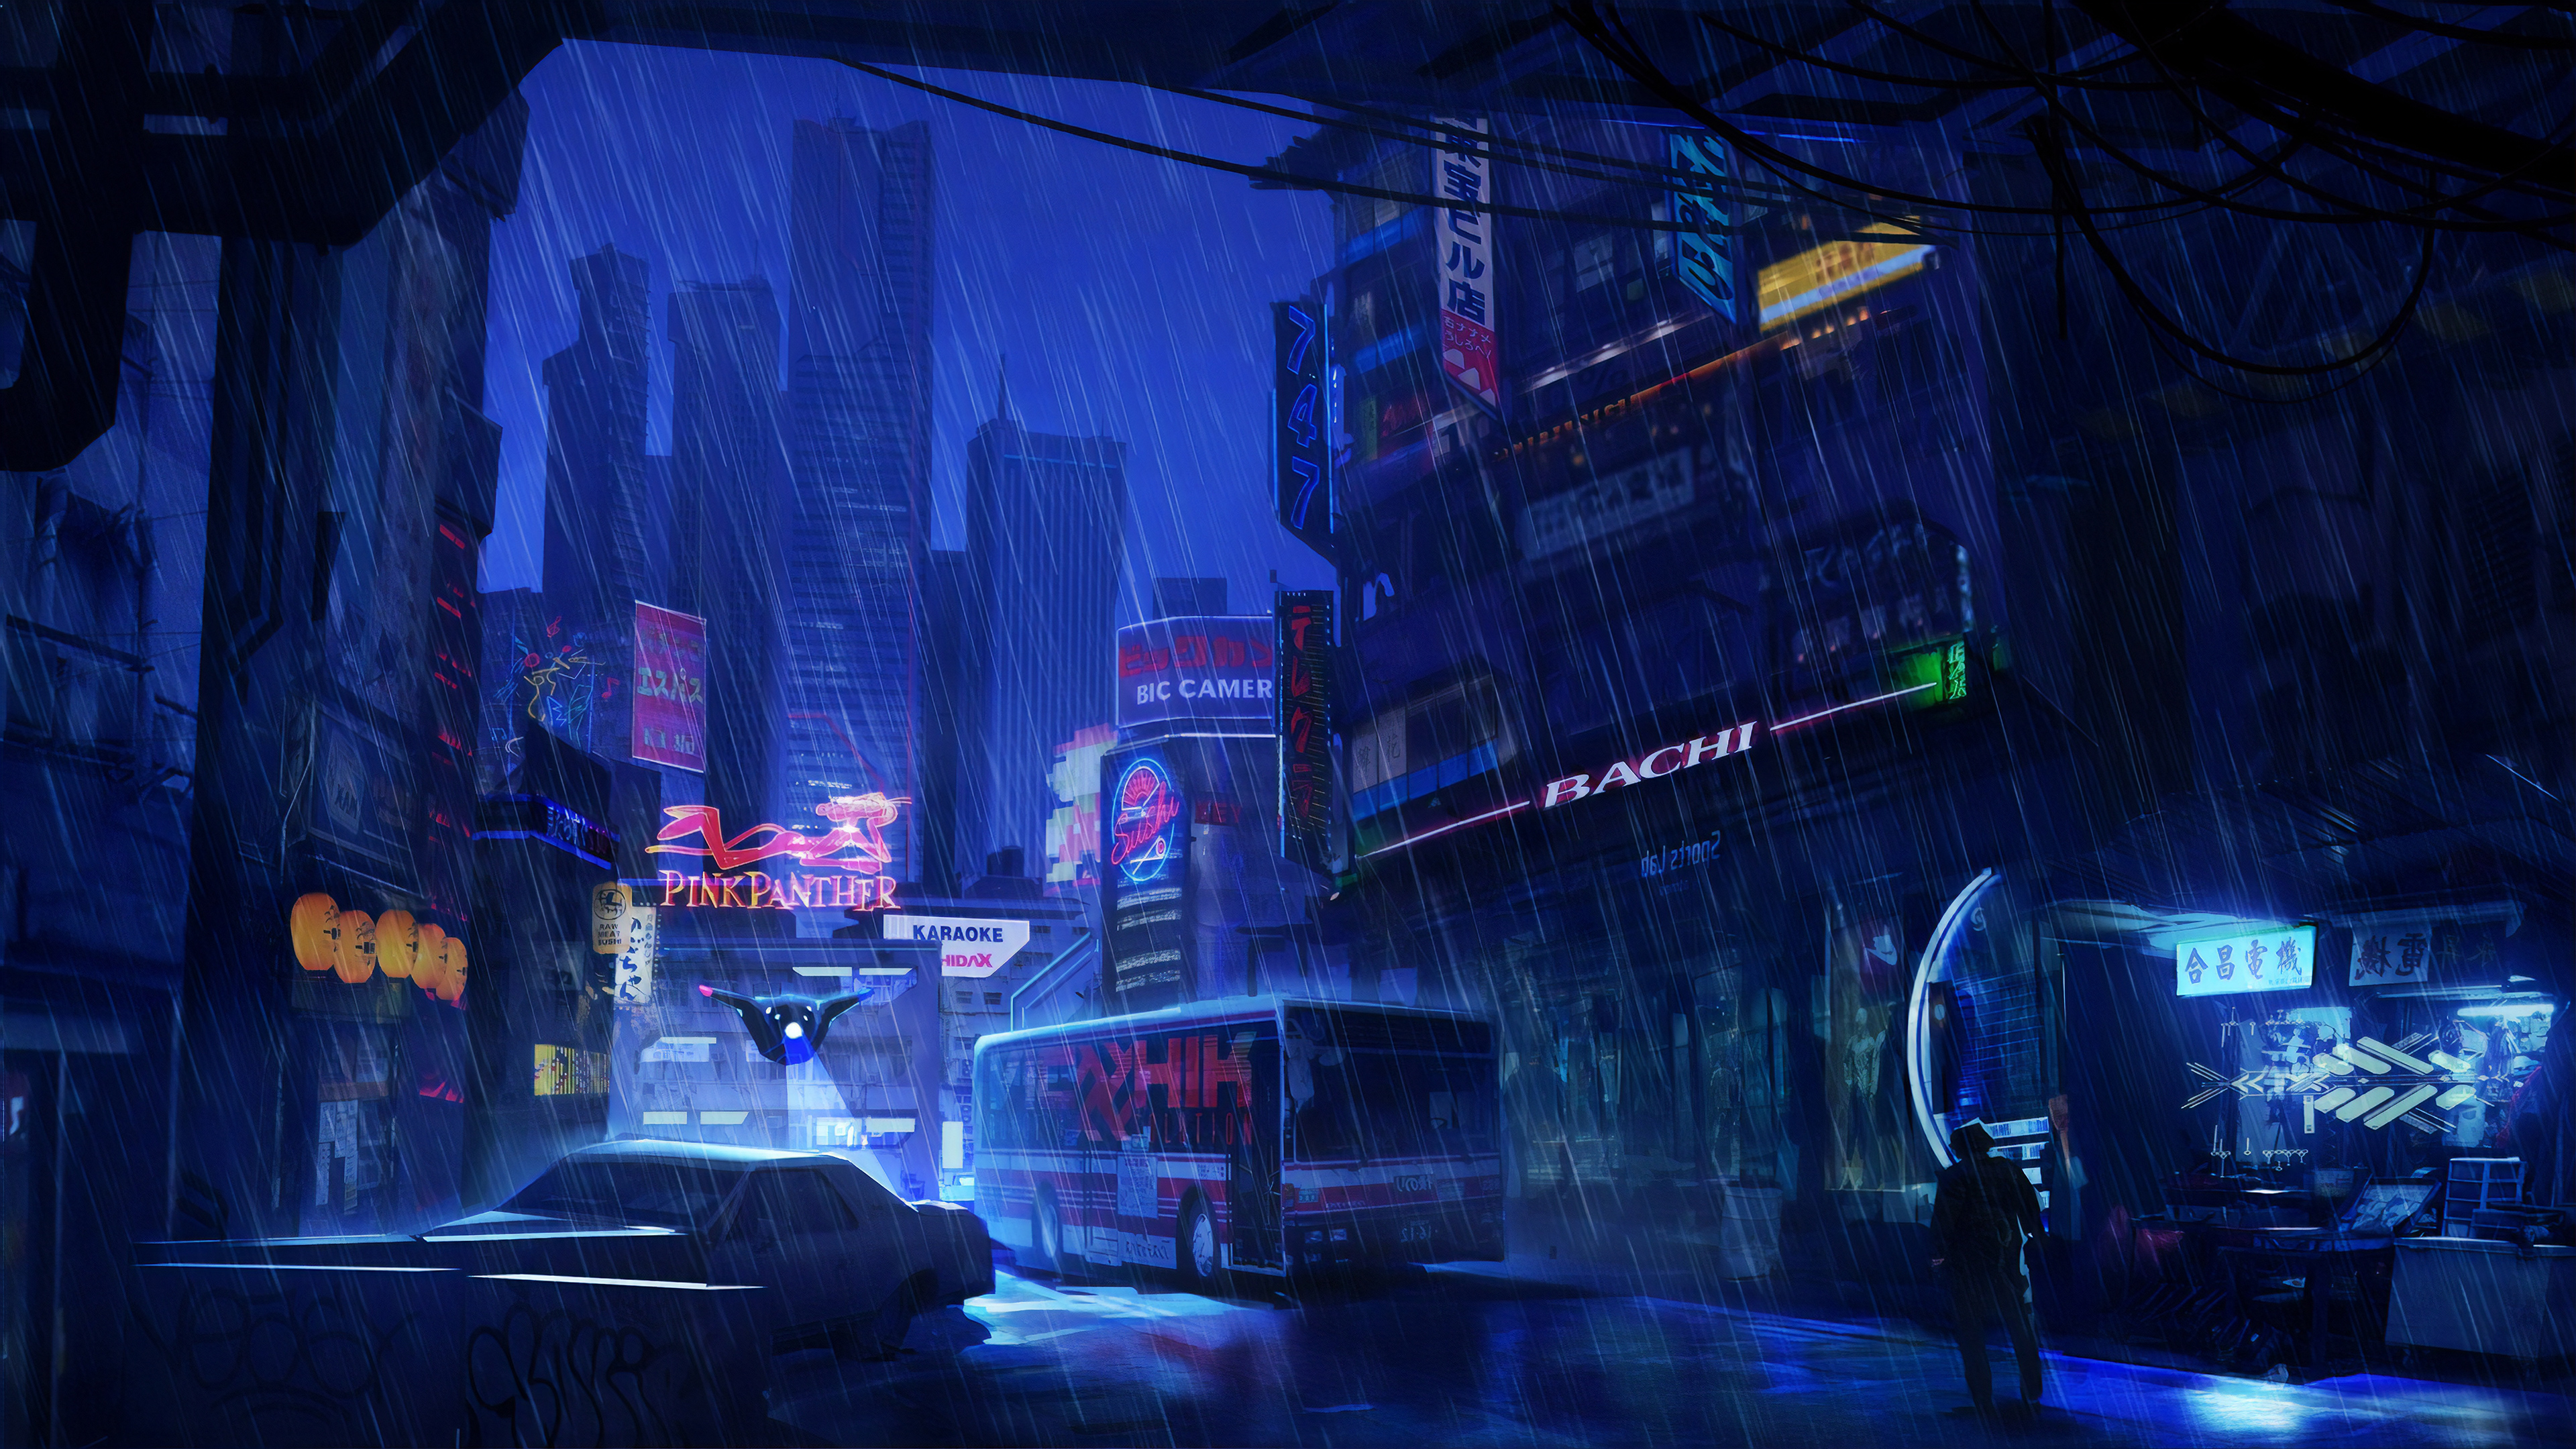 City 4k Ultra Hd Wallpaper Background Image 3840x2160